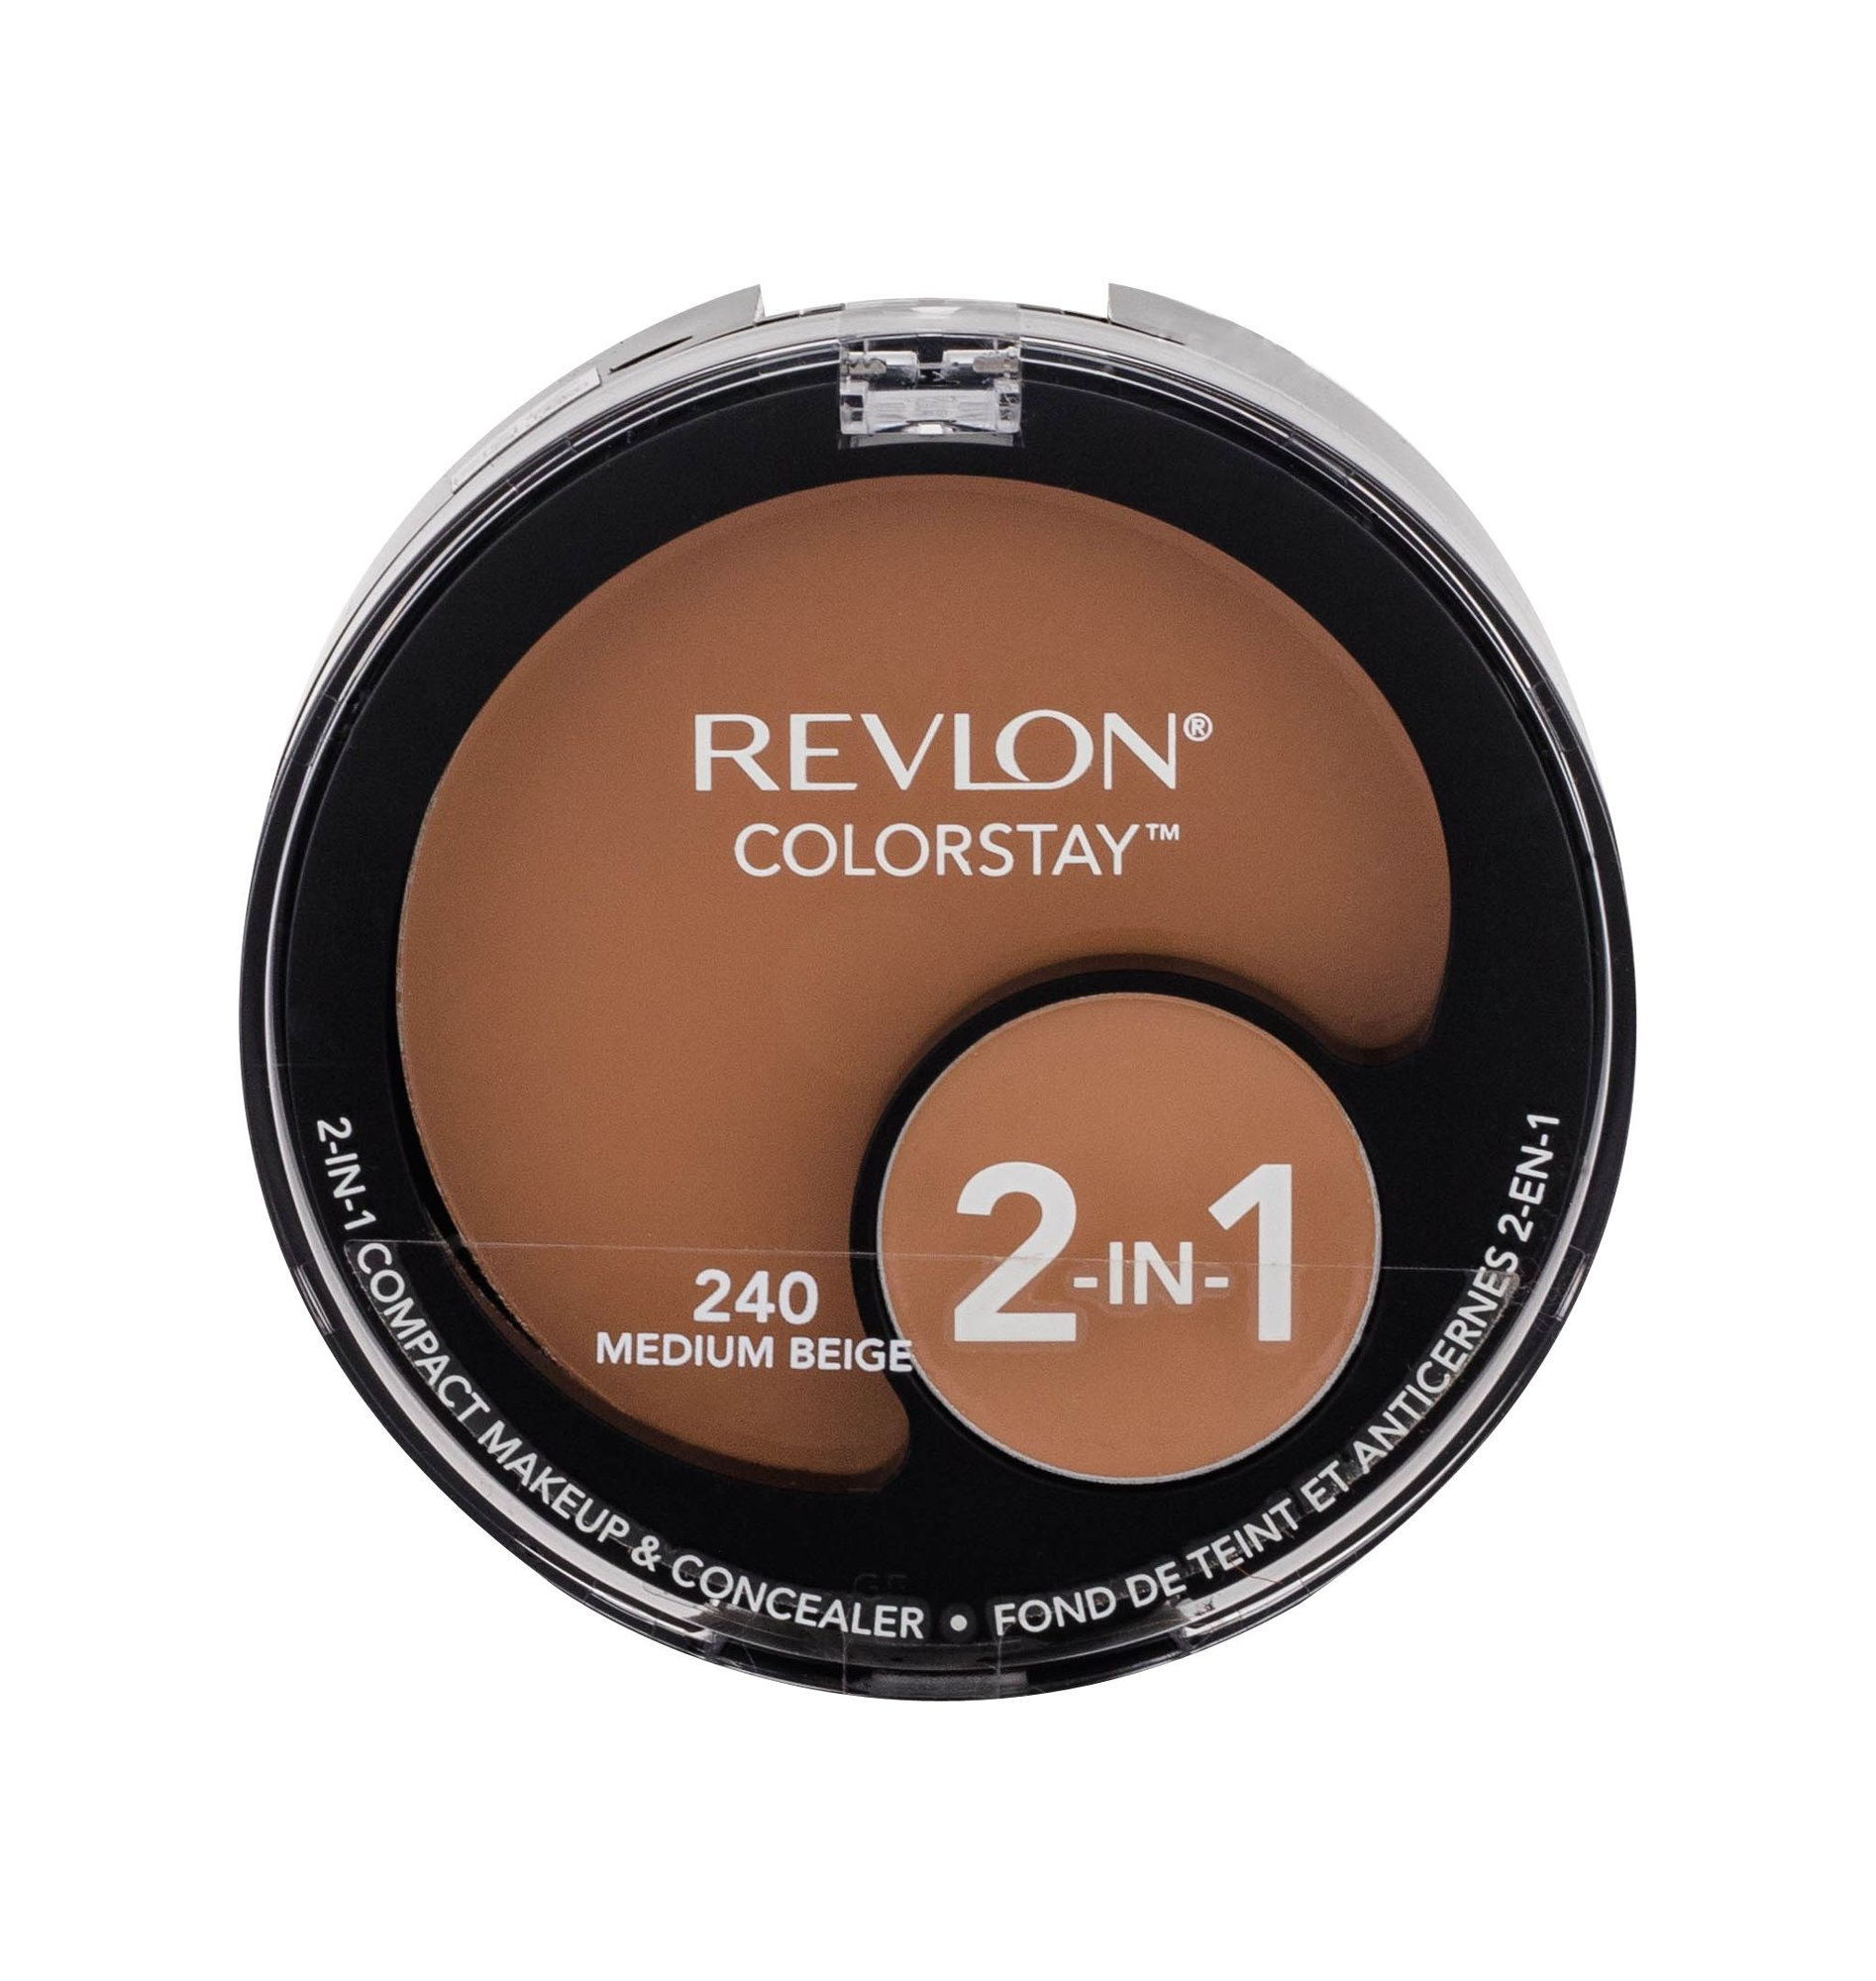 Revlon Colorstay Makeup 12,3ml 240 Medium Beige